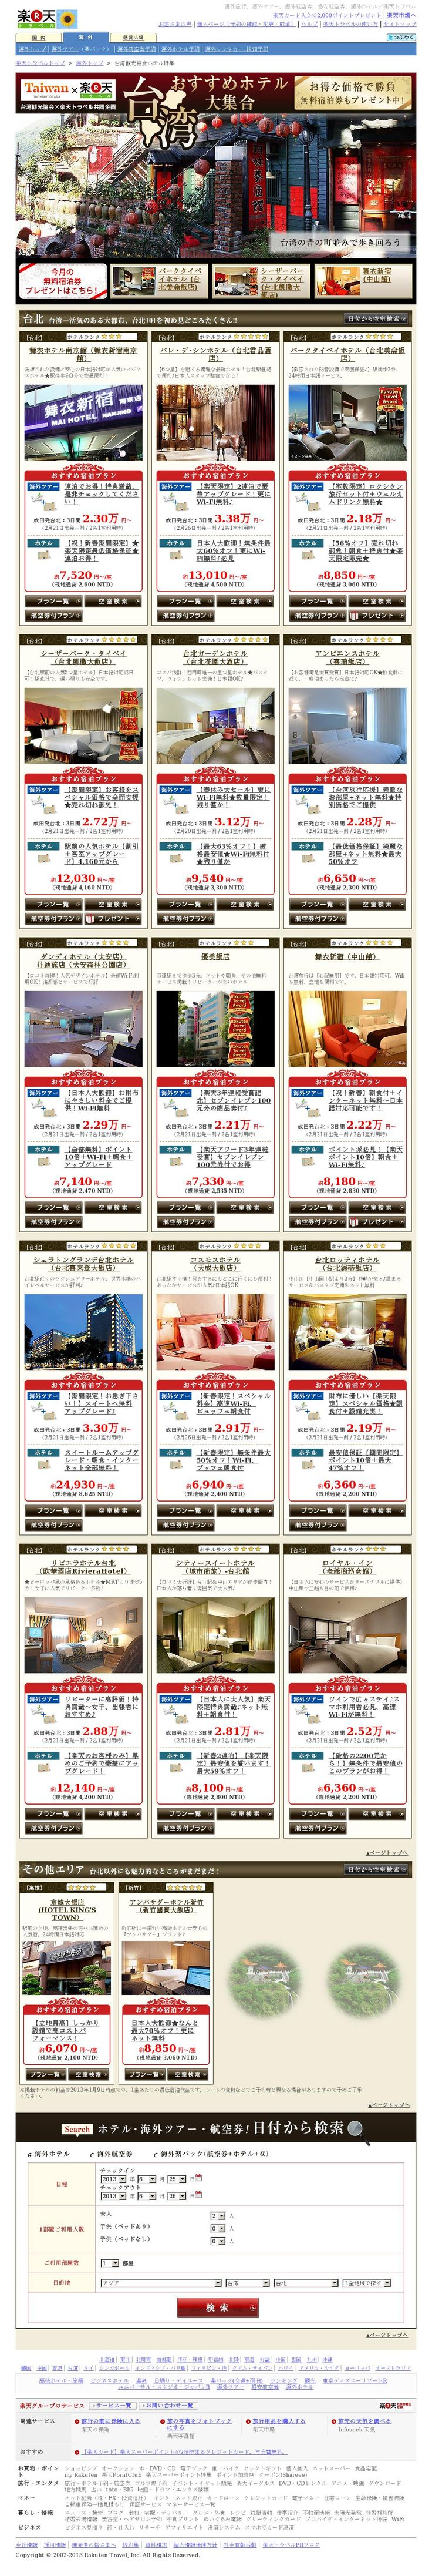 【D/C】【広告】台湾ホテルピックアップ特集×政観<2013/01/16>